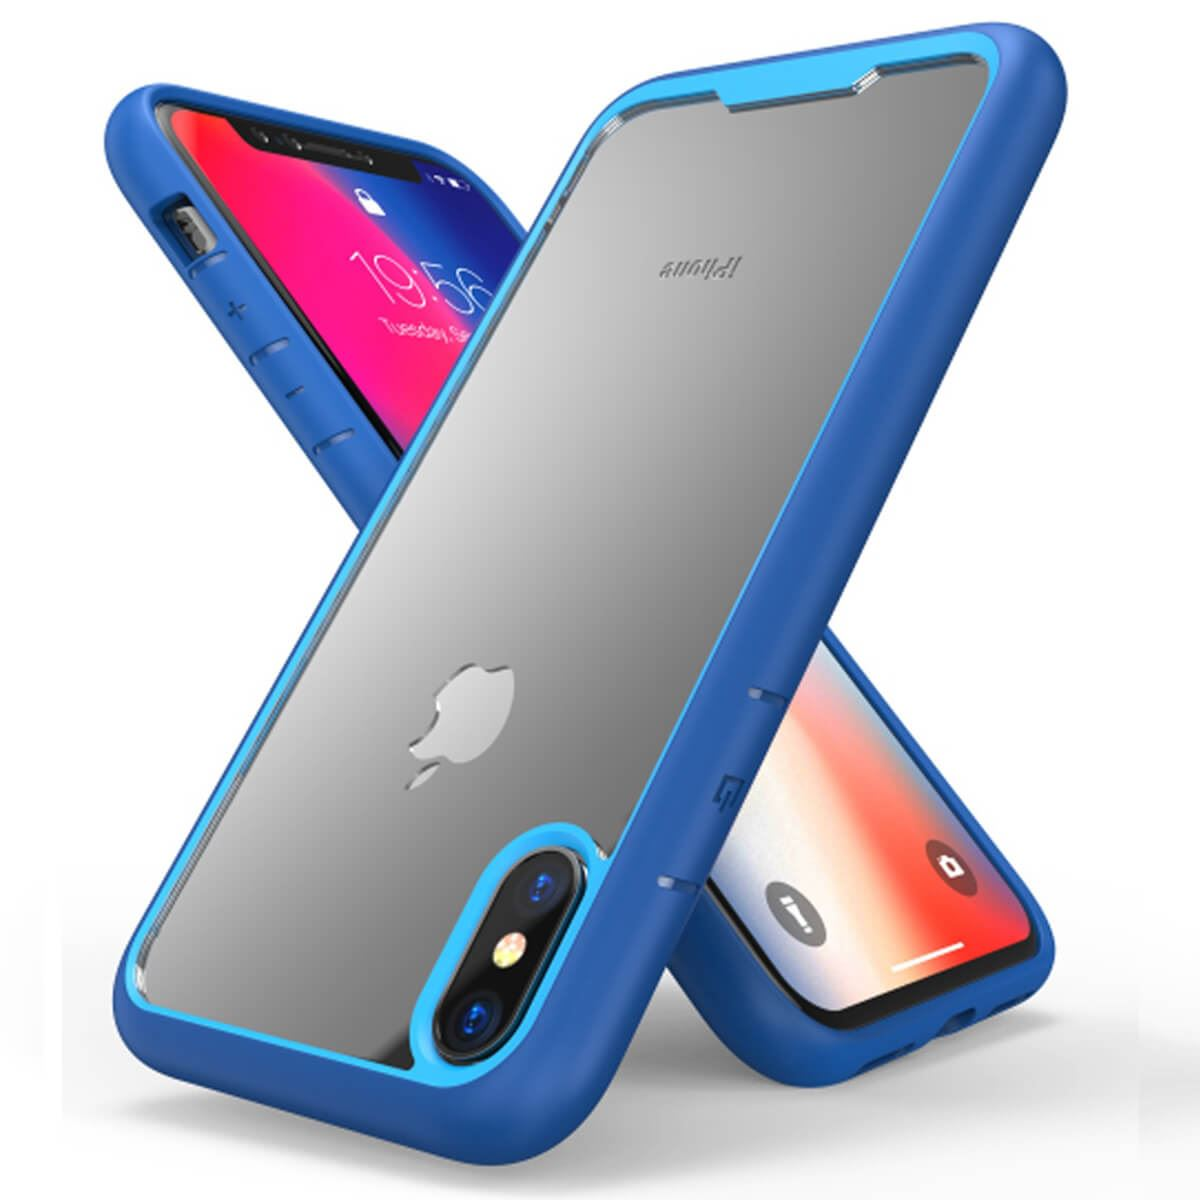 Shockproof-Bumper-Case-For-iPhone-X-XS-XR-6-Plus-7-Plus-6-Plus-Hard-Armor thumbnail 9